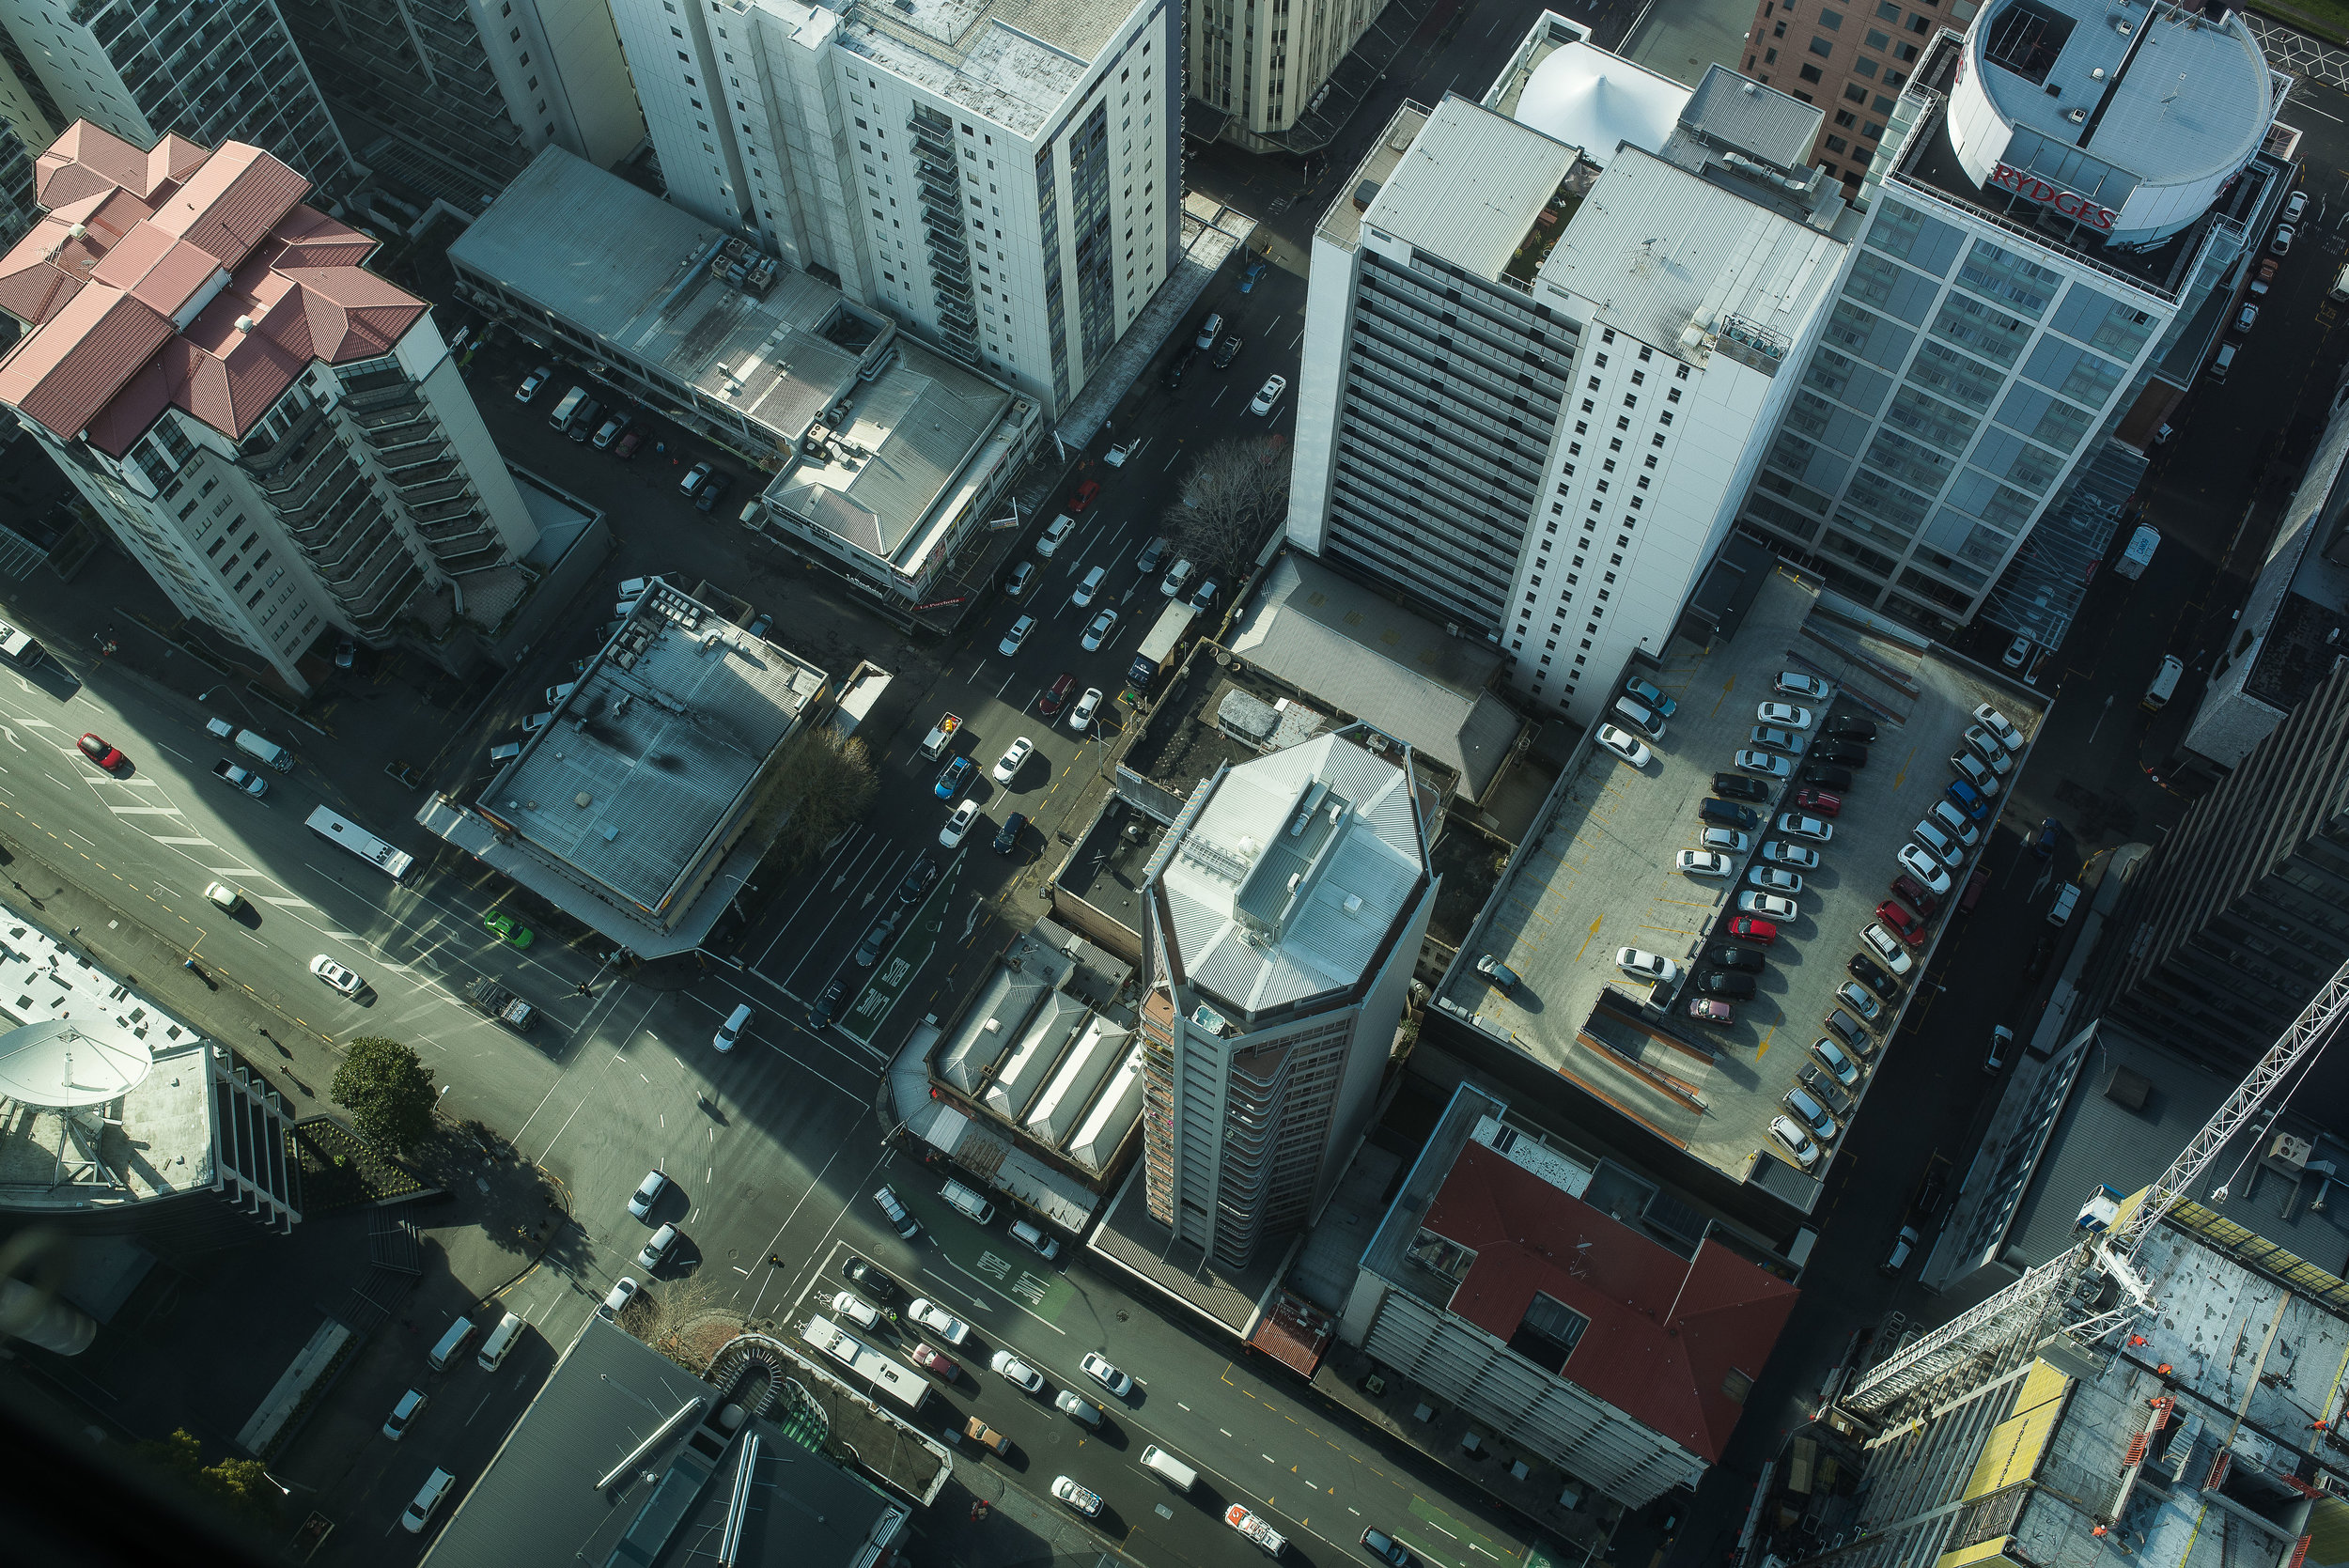 SkyTower_View_Street_renrob©.jpg